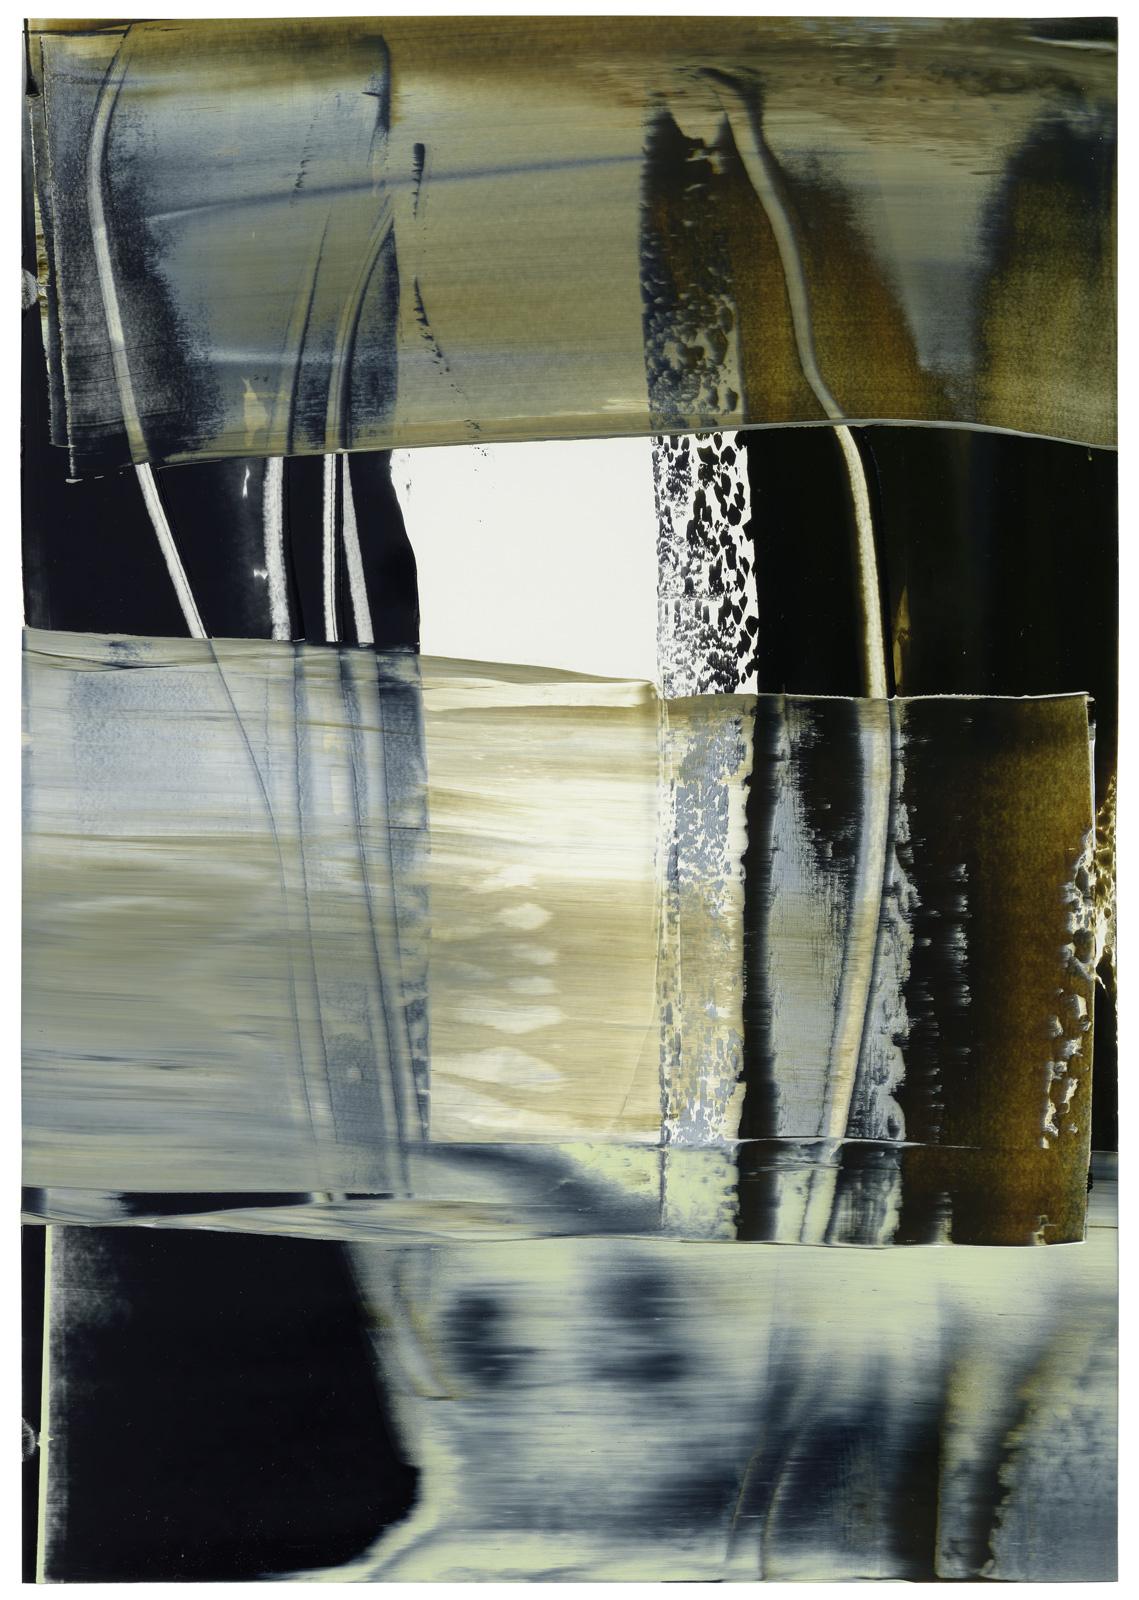 Sepia, Öl auf Papier, 51x36cm, 2019